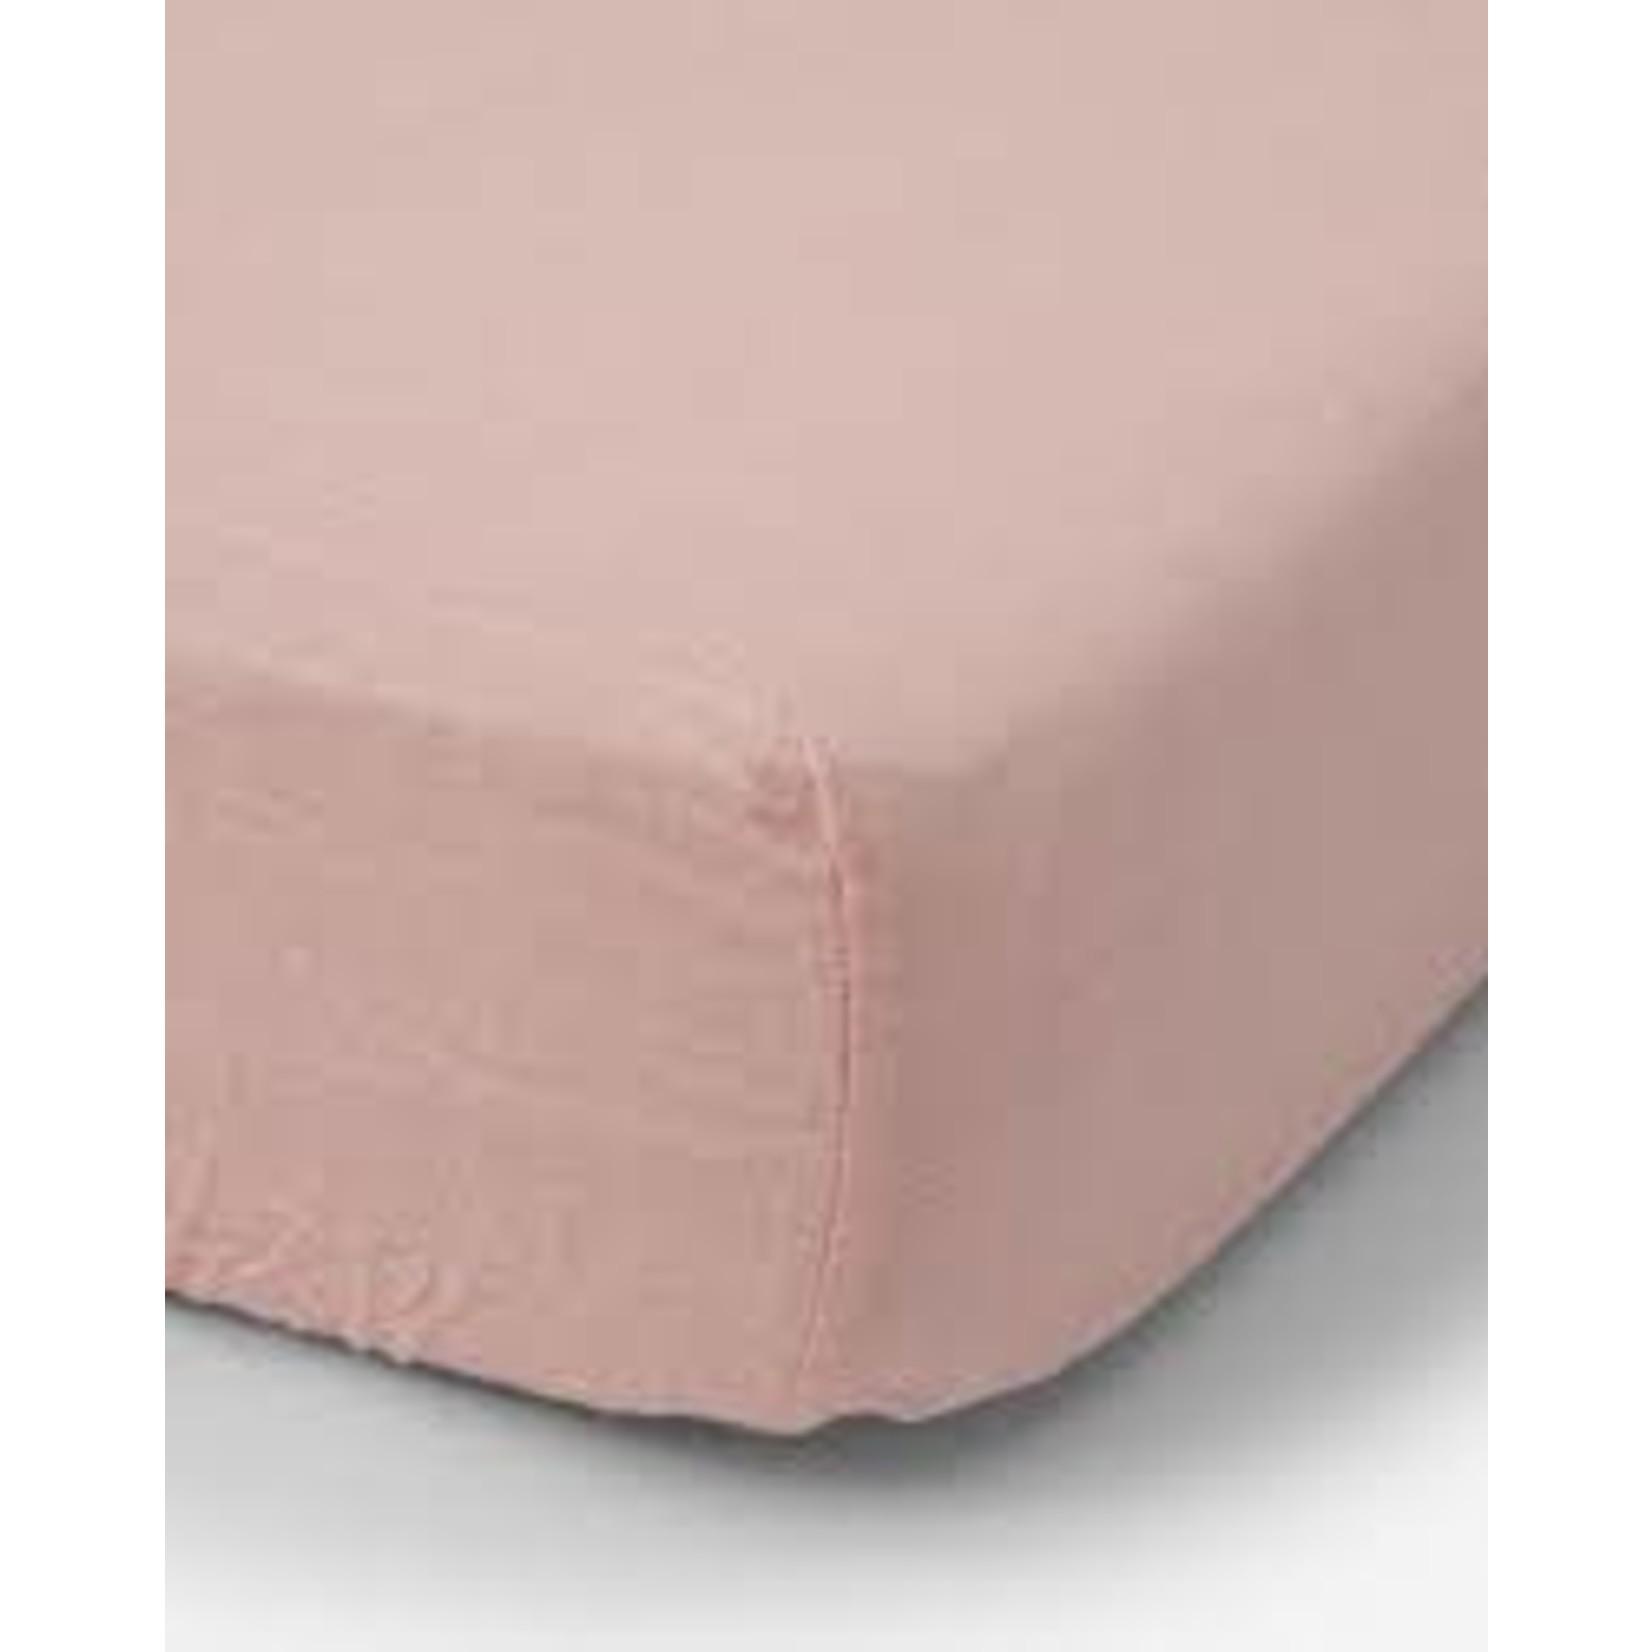 Little Unicorn Cotton Muslin Crib Sheet - Rose Petal